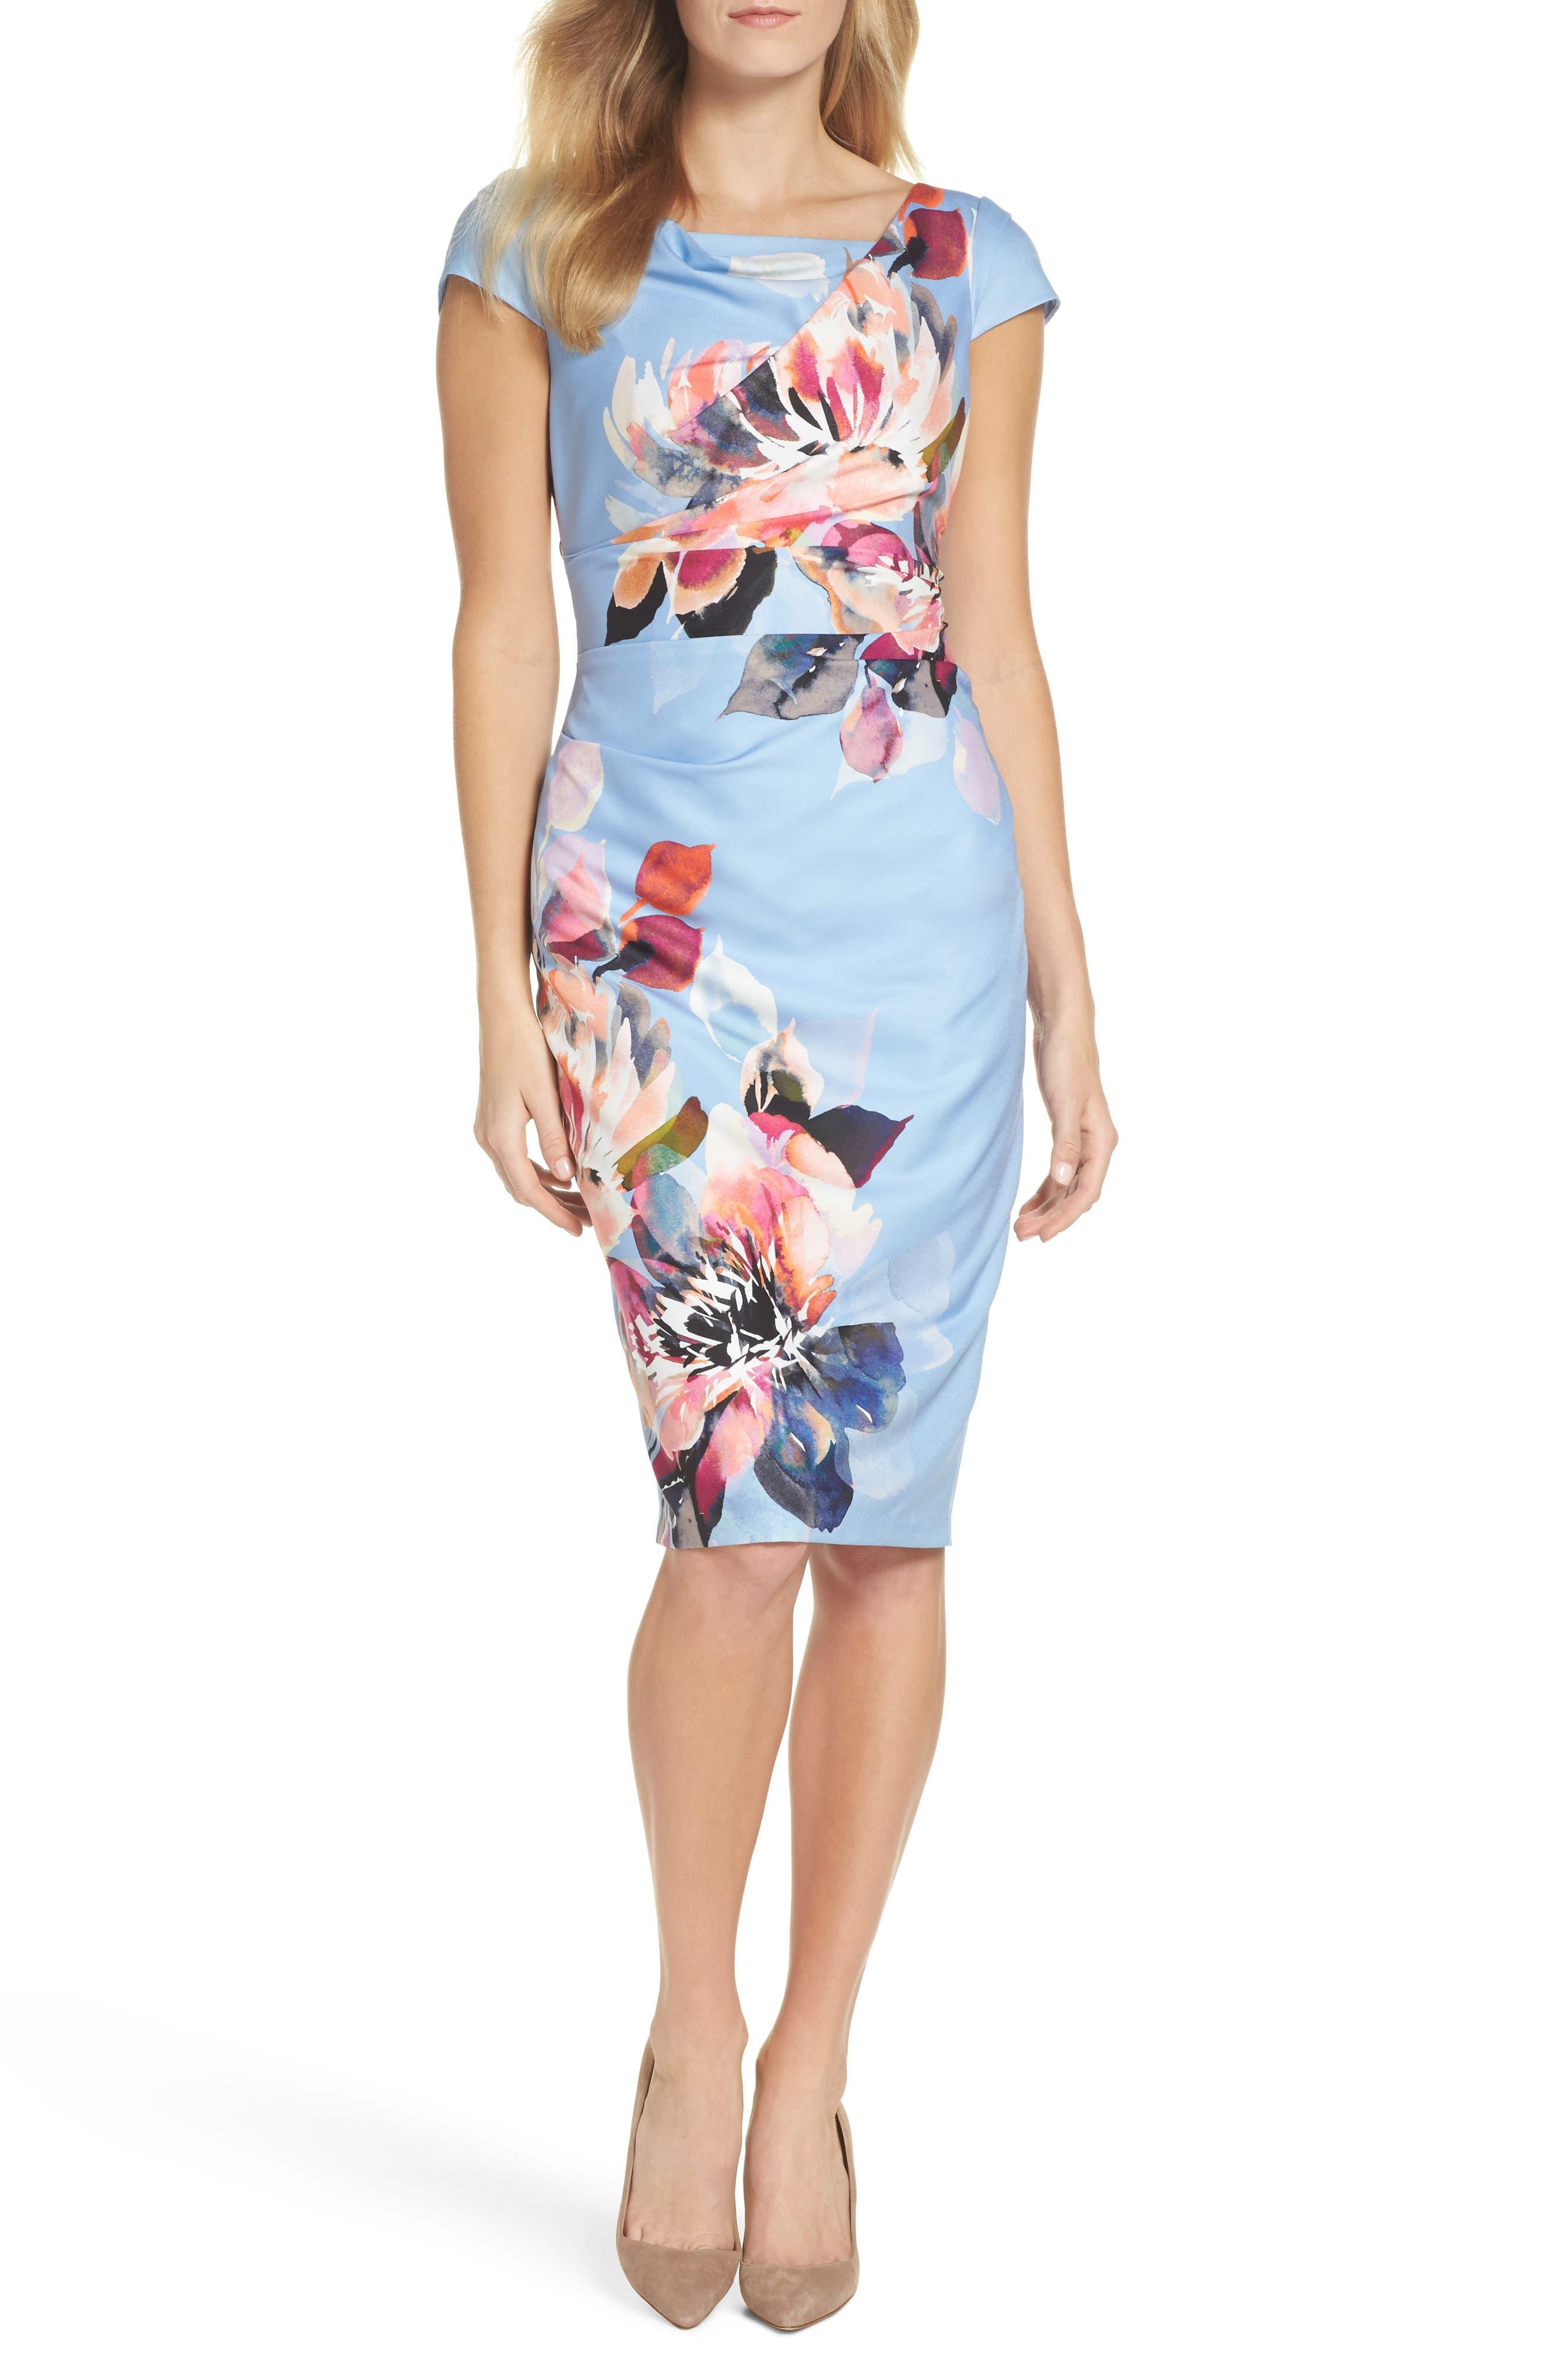 Magnolia Cowl Neck Sheath Dress,                         Main,                         color, Blue Multi